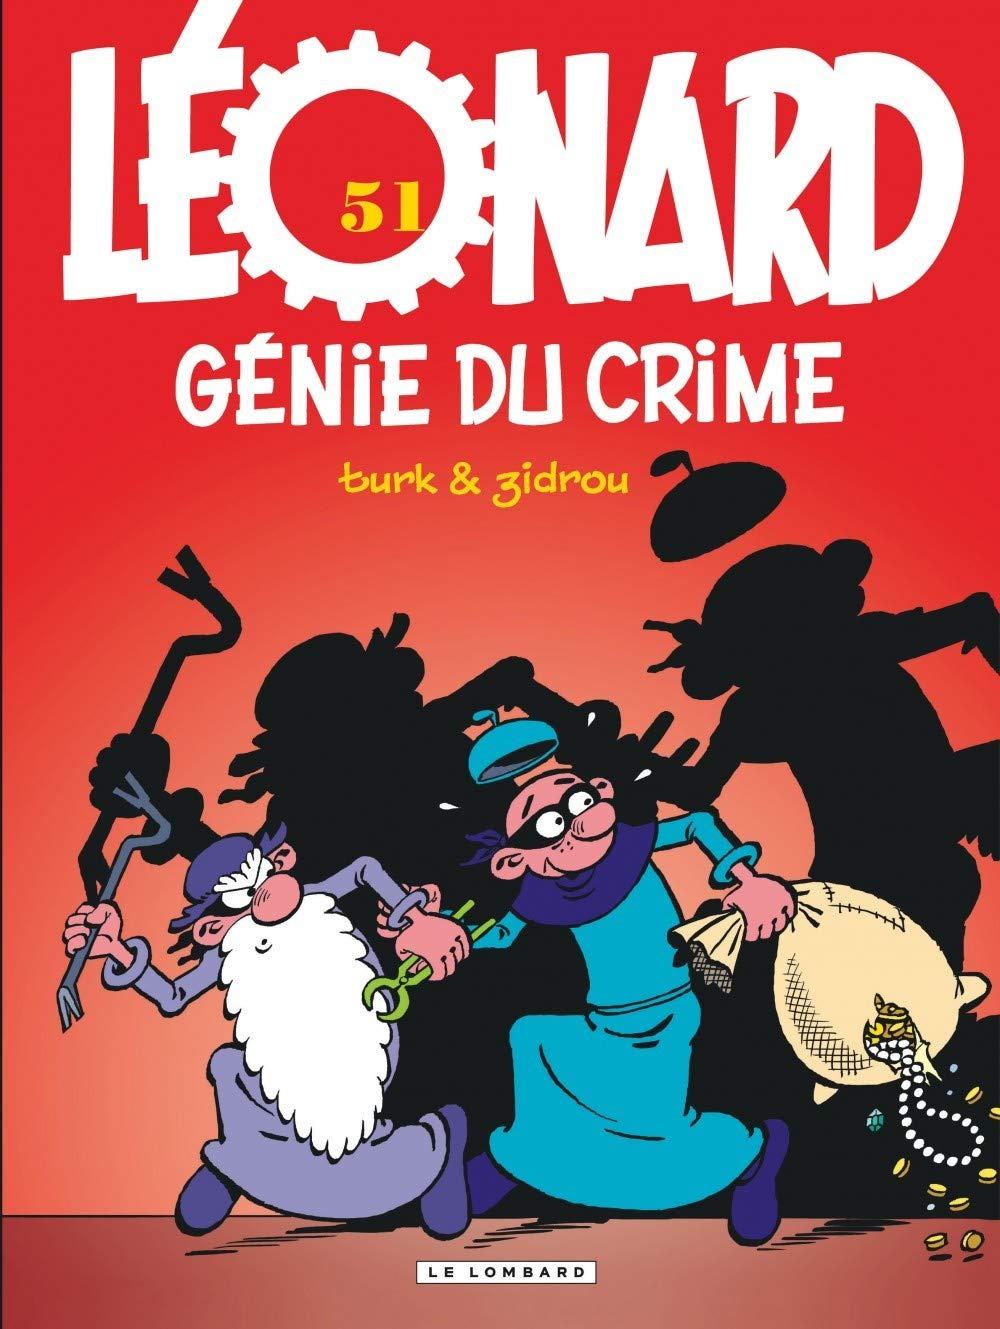 Léonard 51 - Génie du crime